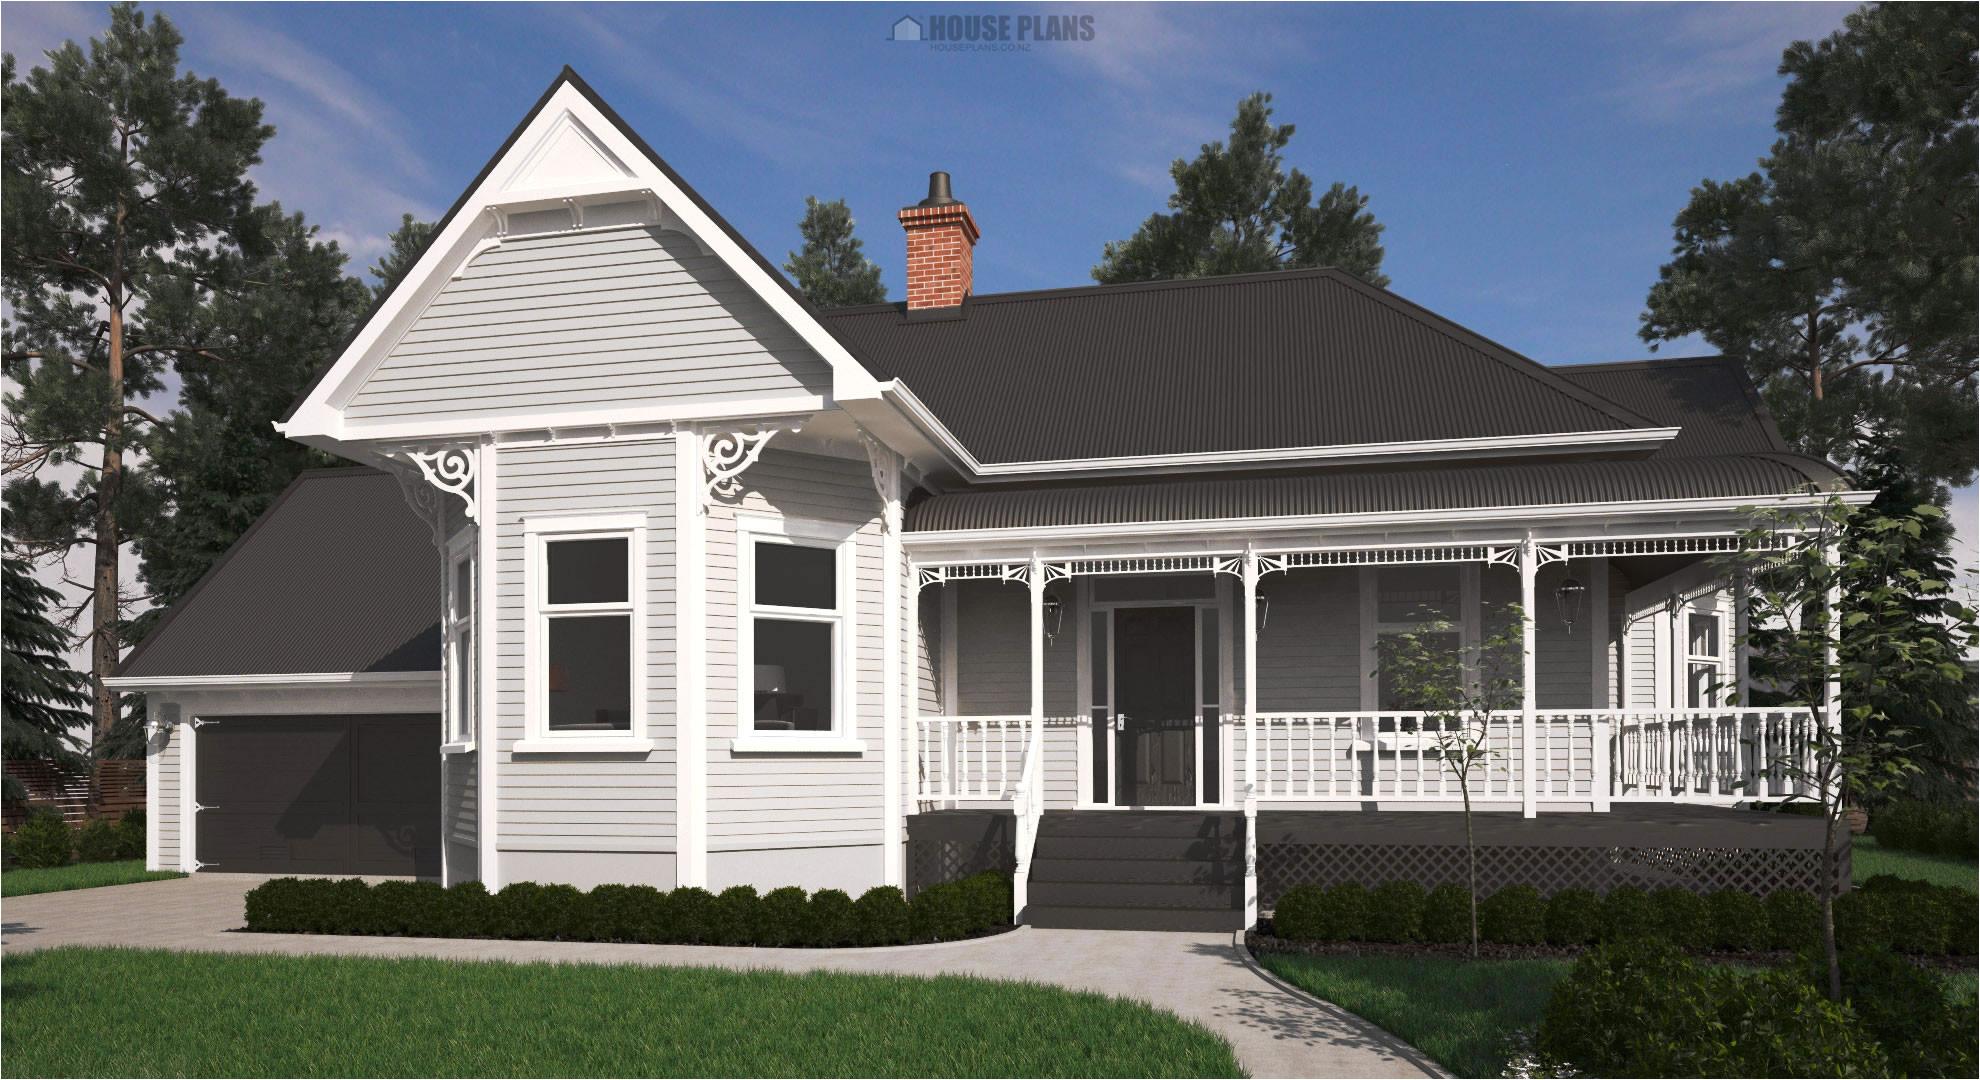 New Home Plans Nz Victorian Bay Villa House Plans New Zealand Ltd